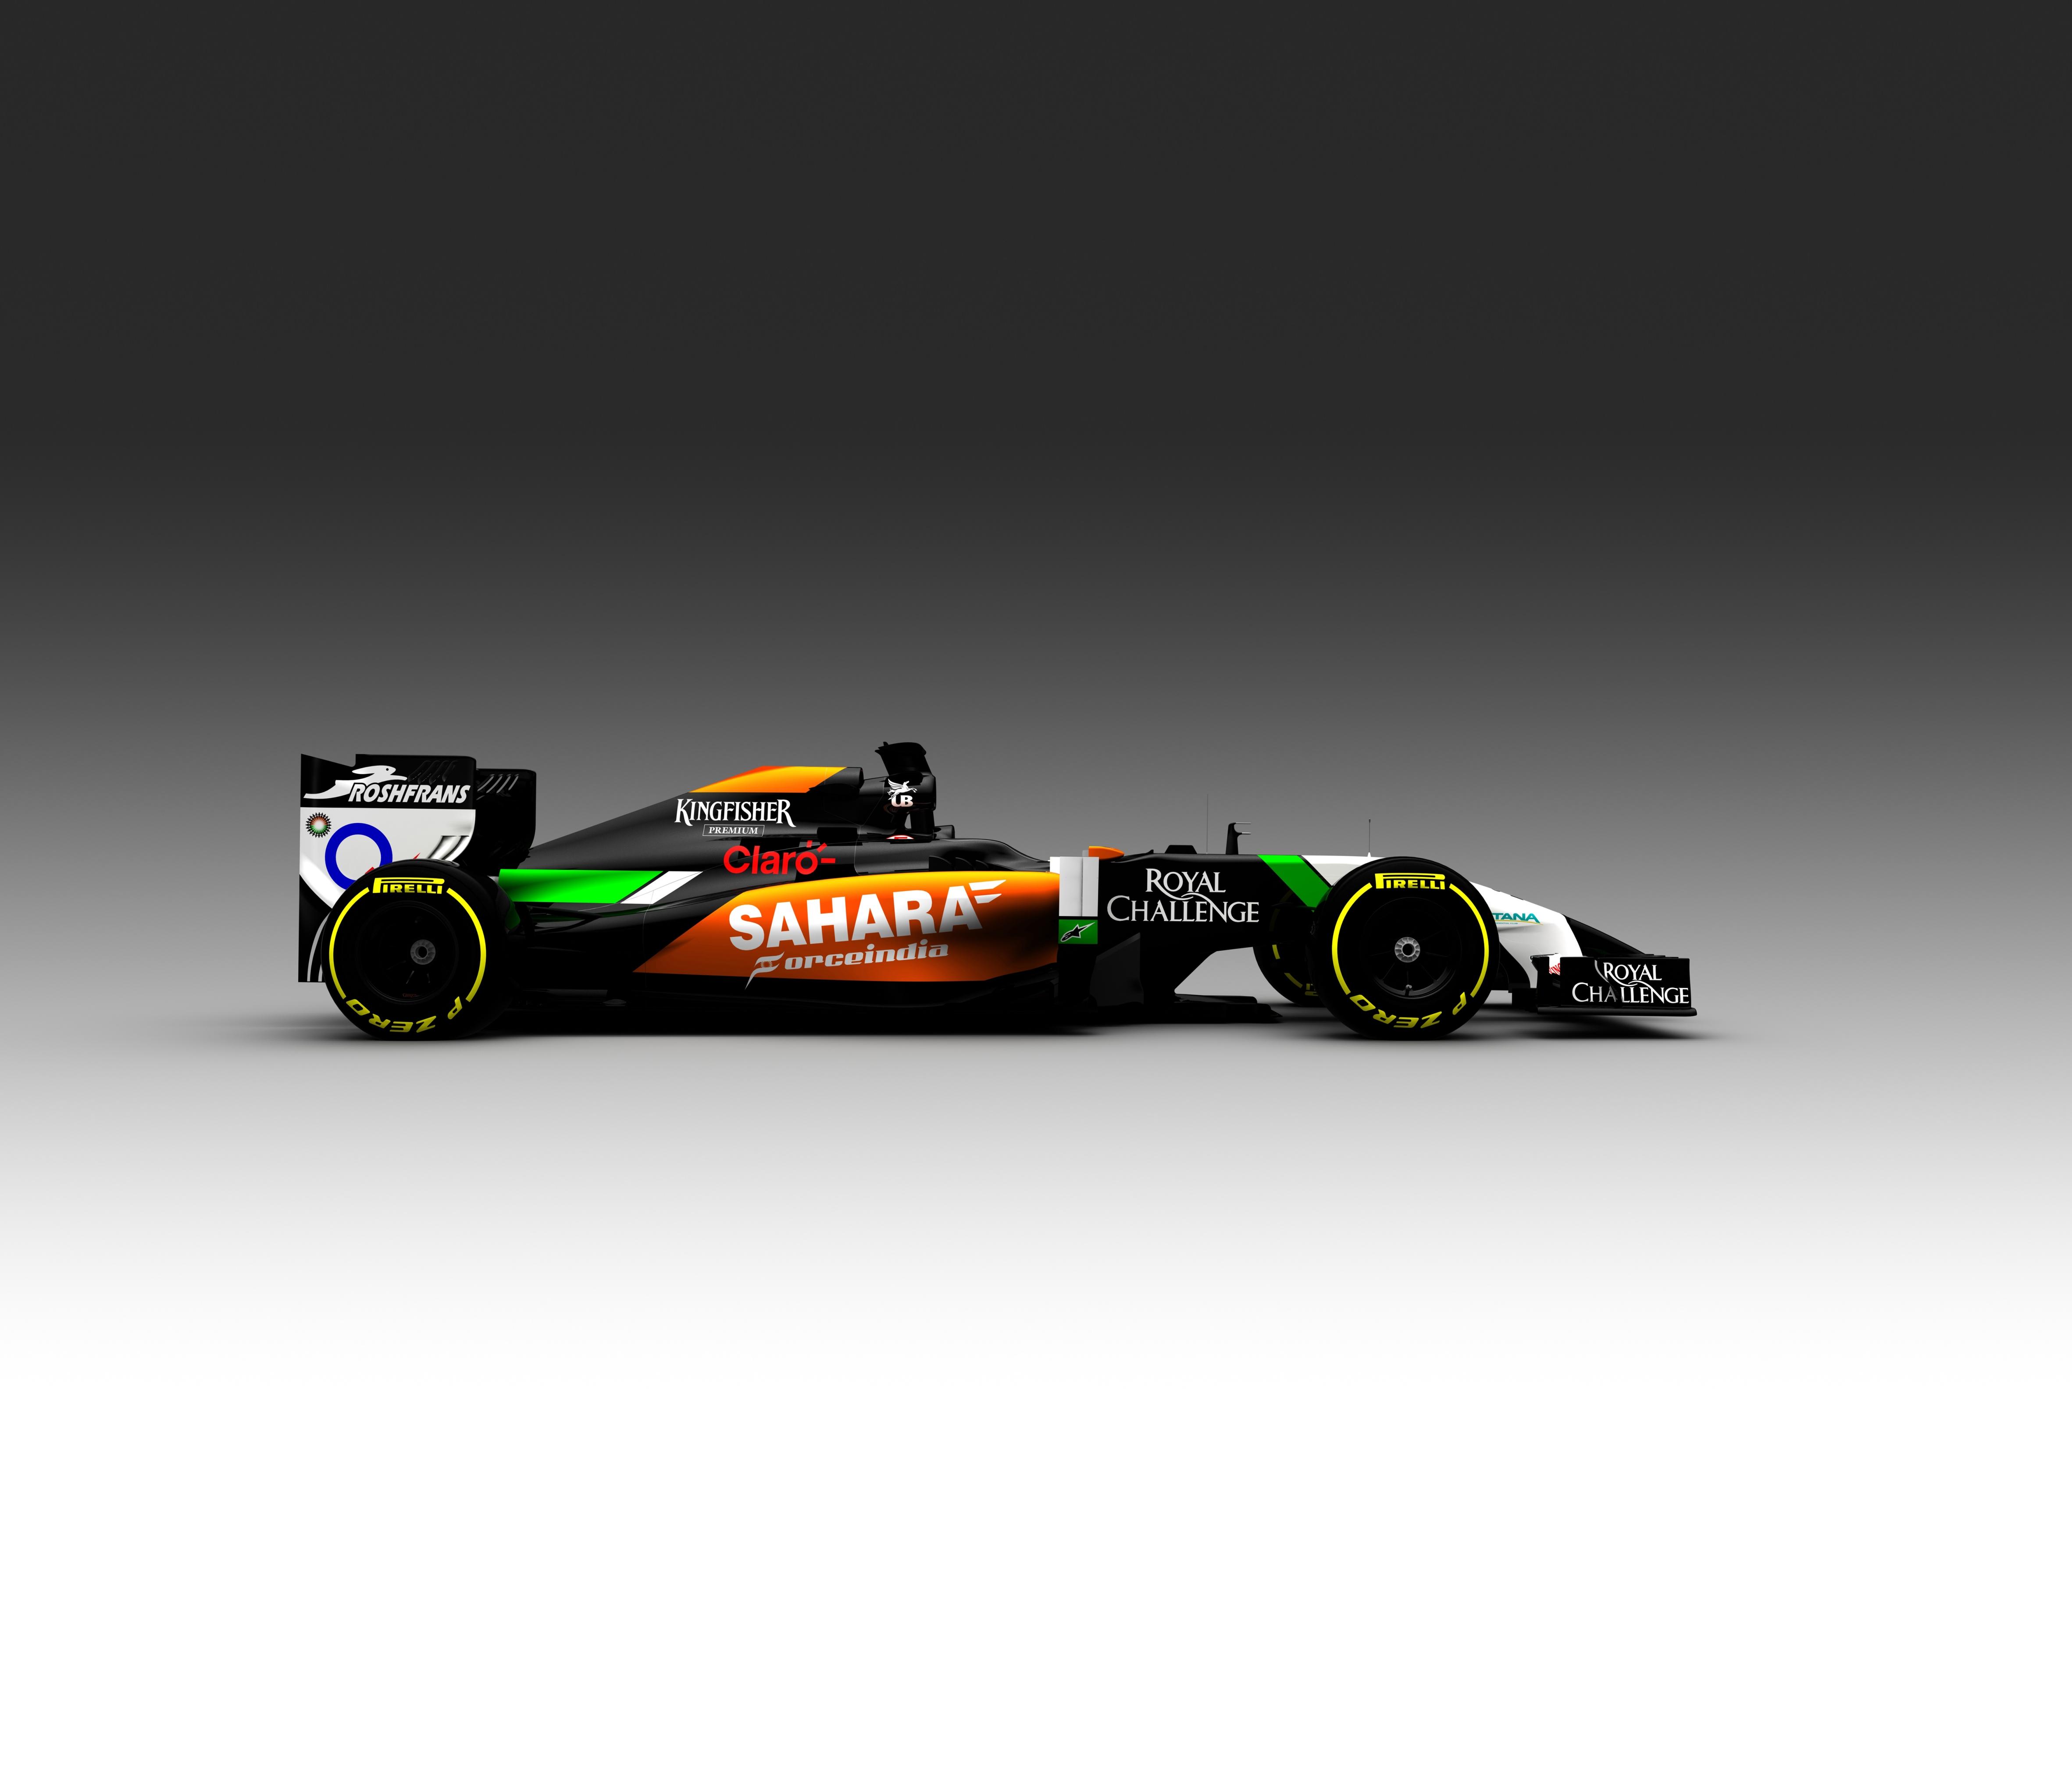 Nuovo look per la Sahara Force India 2014